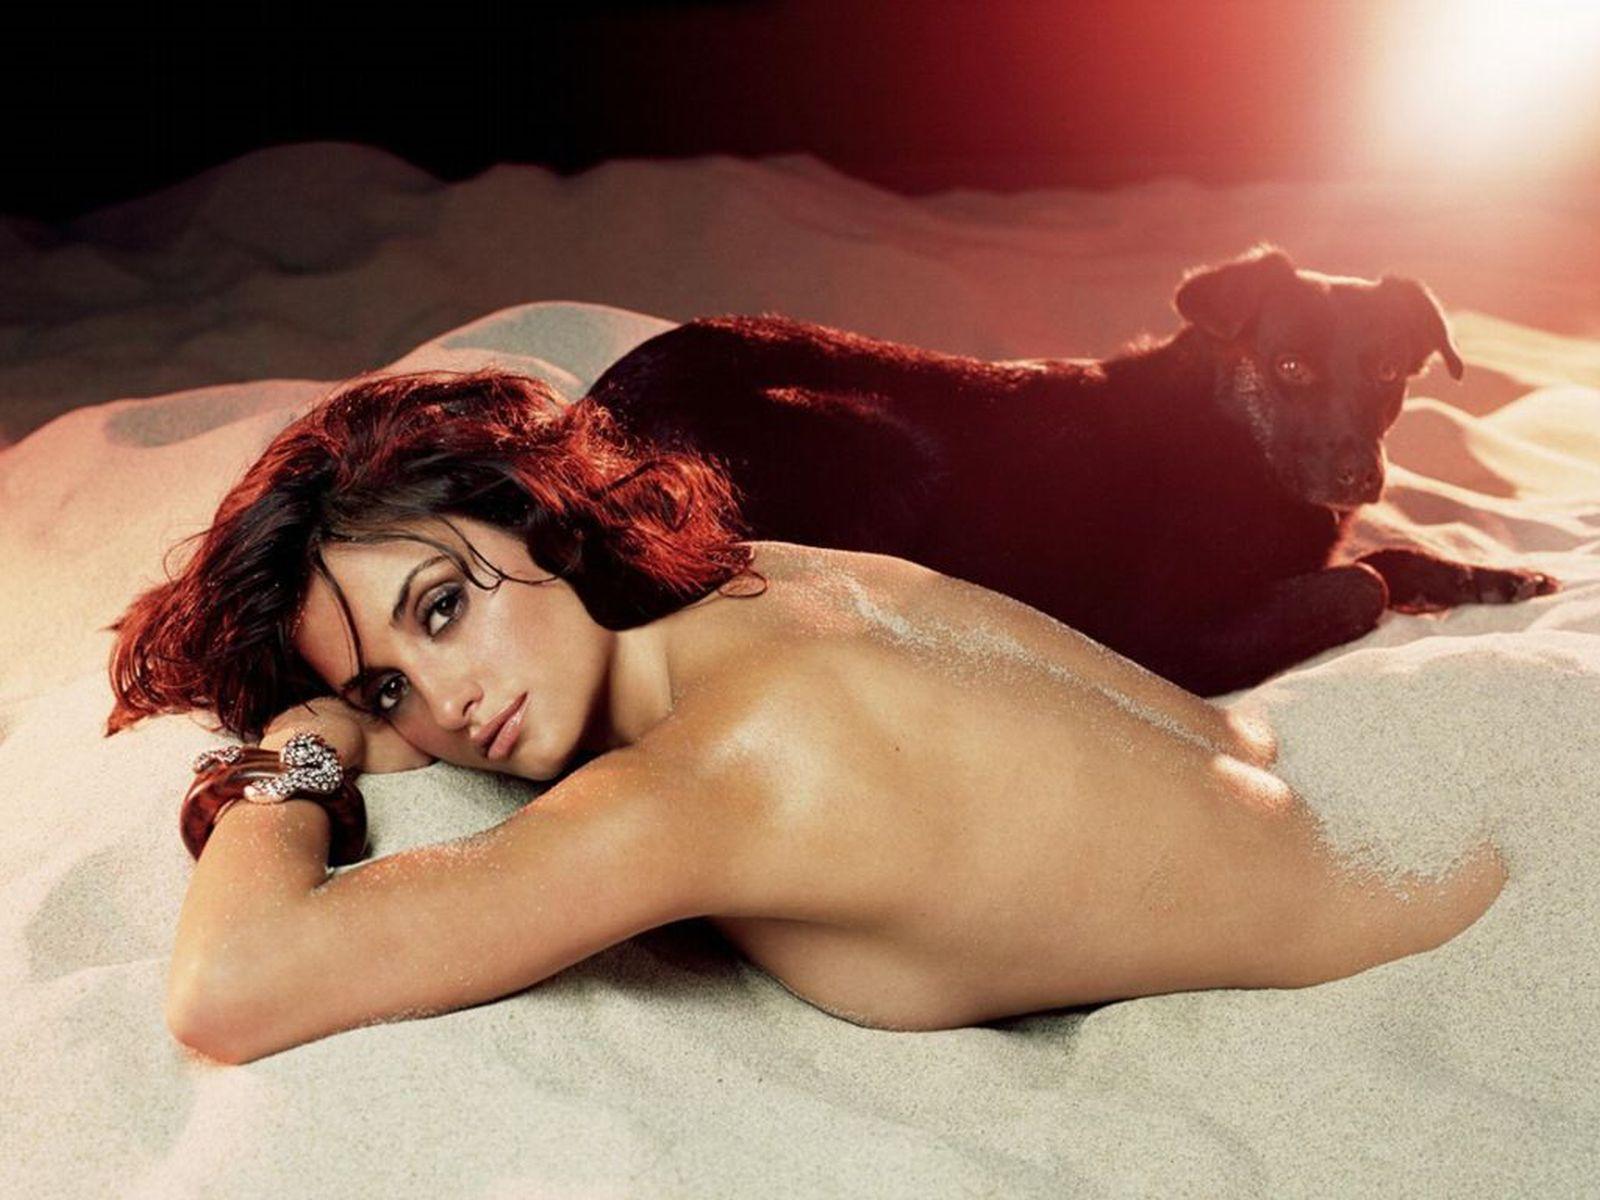 Sexy Penelope Cruz Wallpapers elisha cuthbert bikini beach nude sexy hot gallery pictures nude girls sexy girls on beach topless girls nude ass nude boobs sexy bra blue bra beach girls latest dubai indian  nude fuck lesbian cock girls